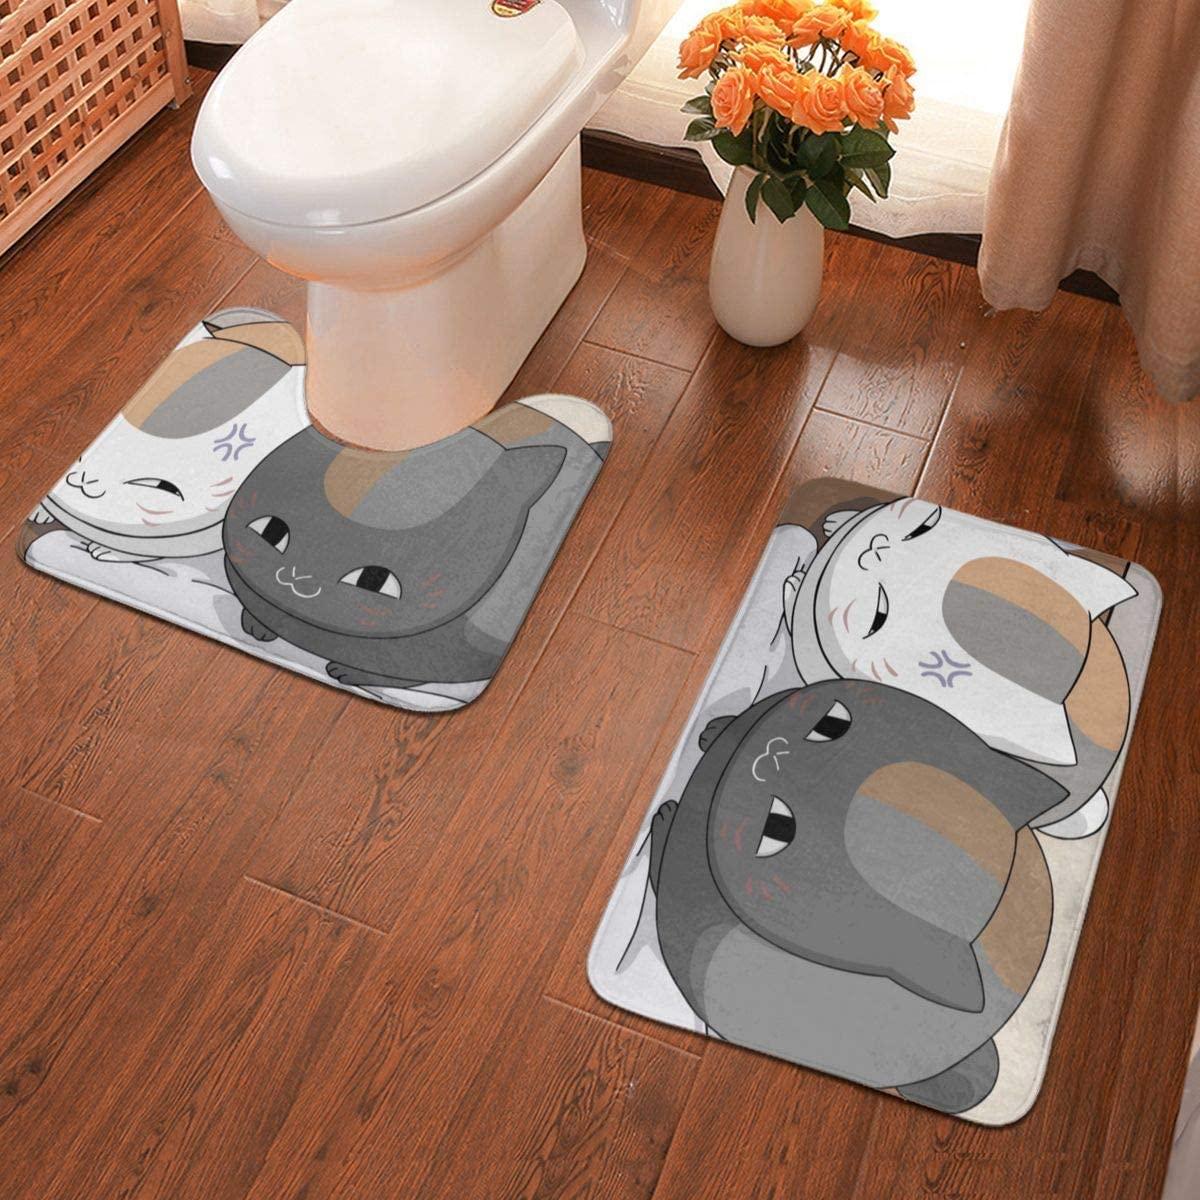 Boweike Natsume Yuujinchou Bathroom Antiskid Pad Non-Slip Bath Carpet Floor Mat Rug 2 Sets -Floor Mat+U-Shaped Pad, Toilet Washable Blanket Mats for Bathroom Home Shower